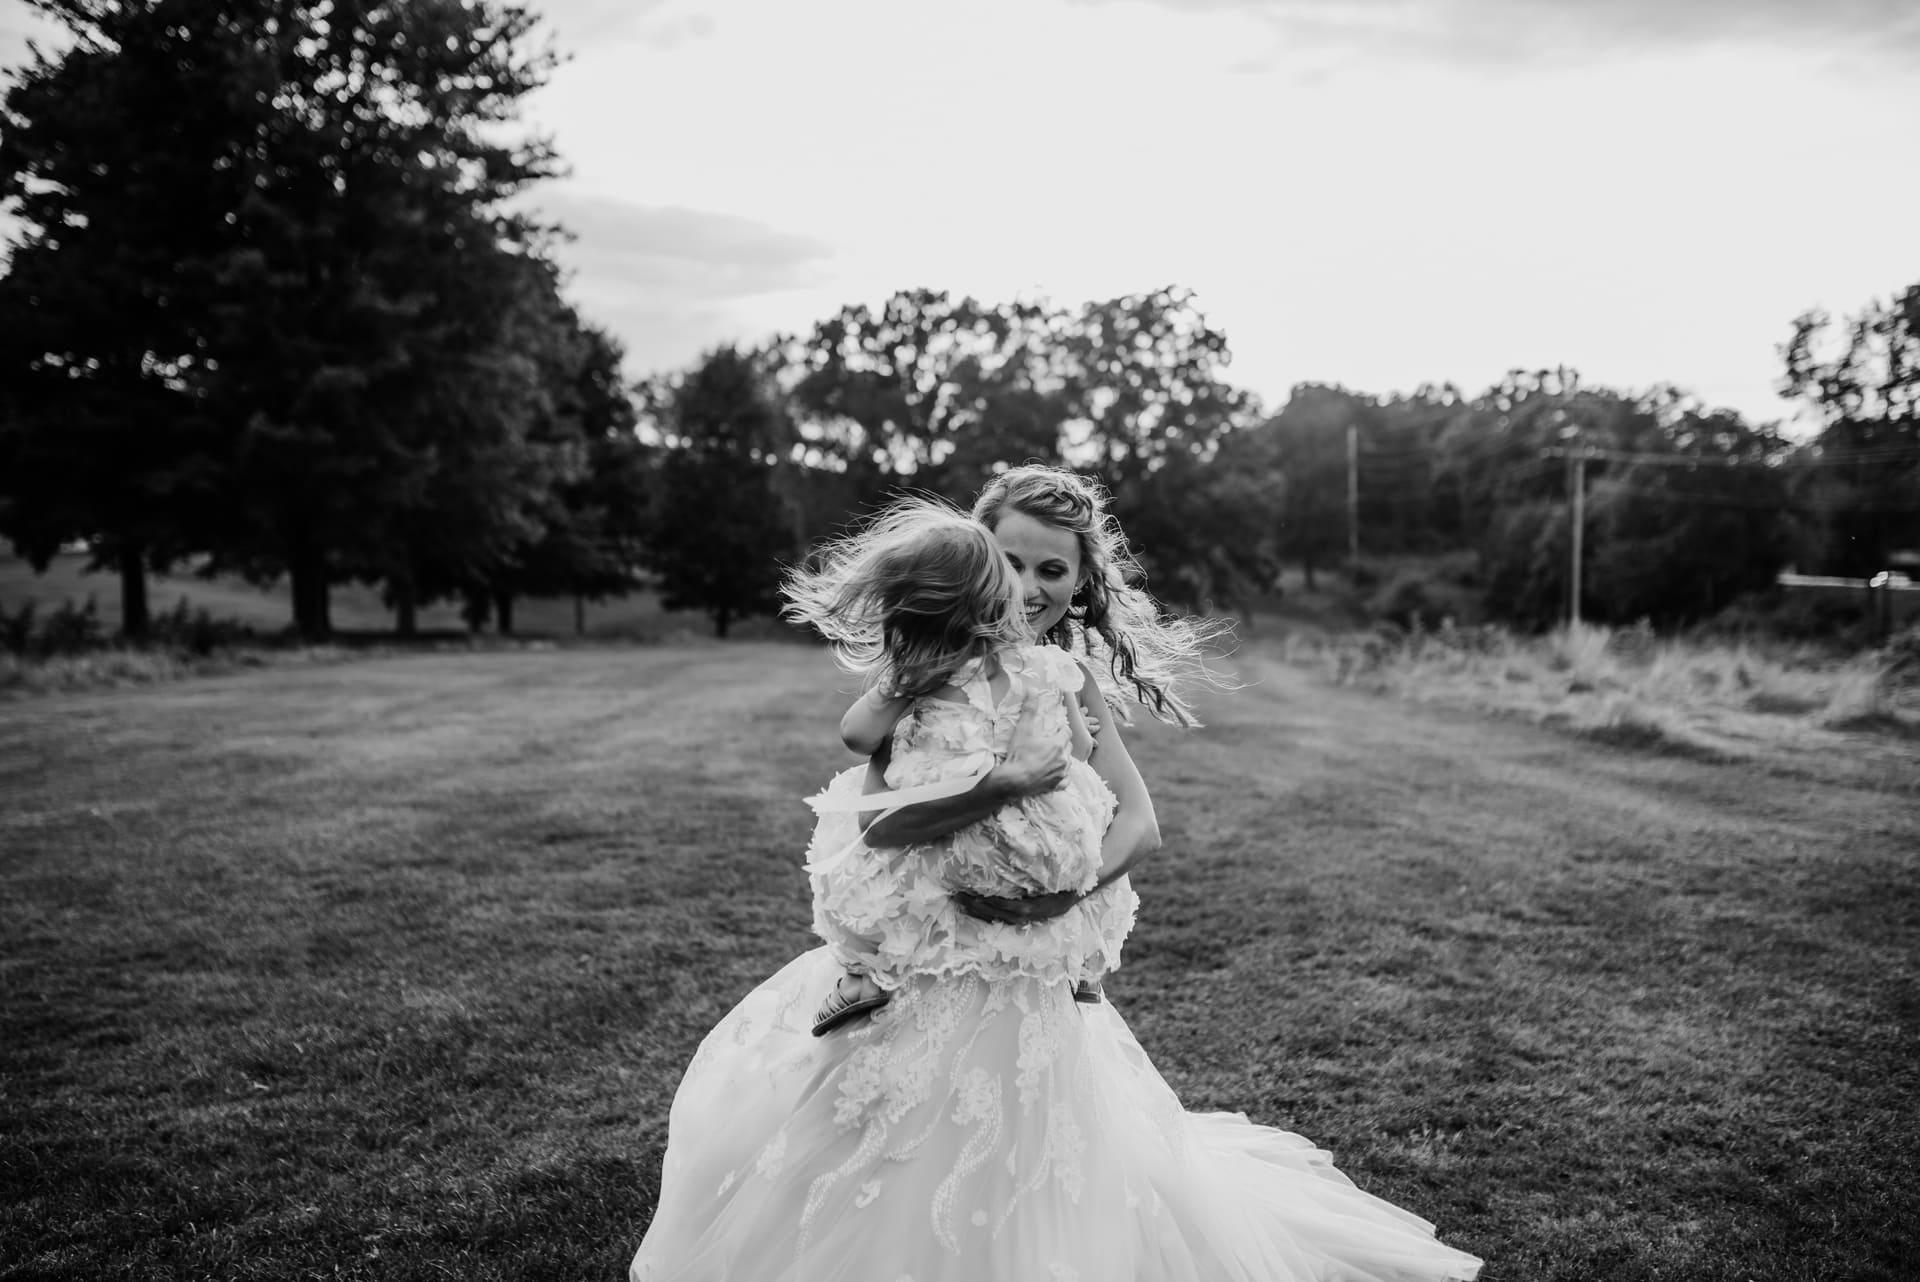 Bride Girl Bnw Richland Michigan Wedding Photography